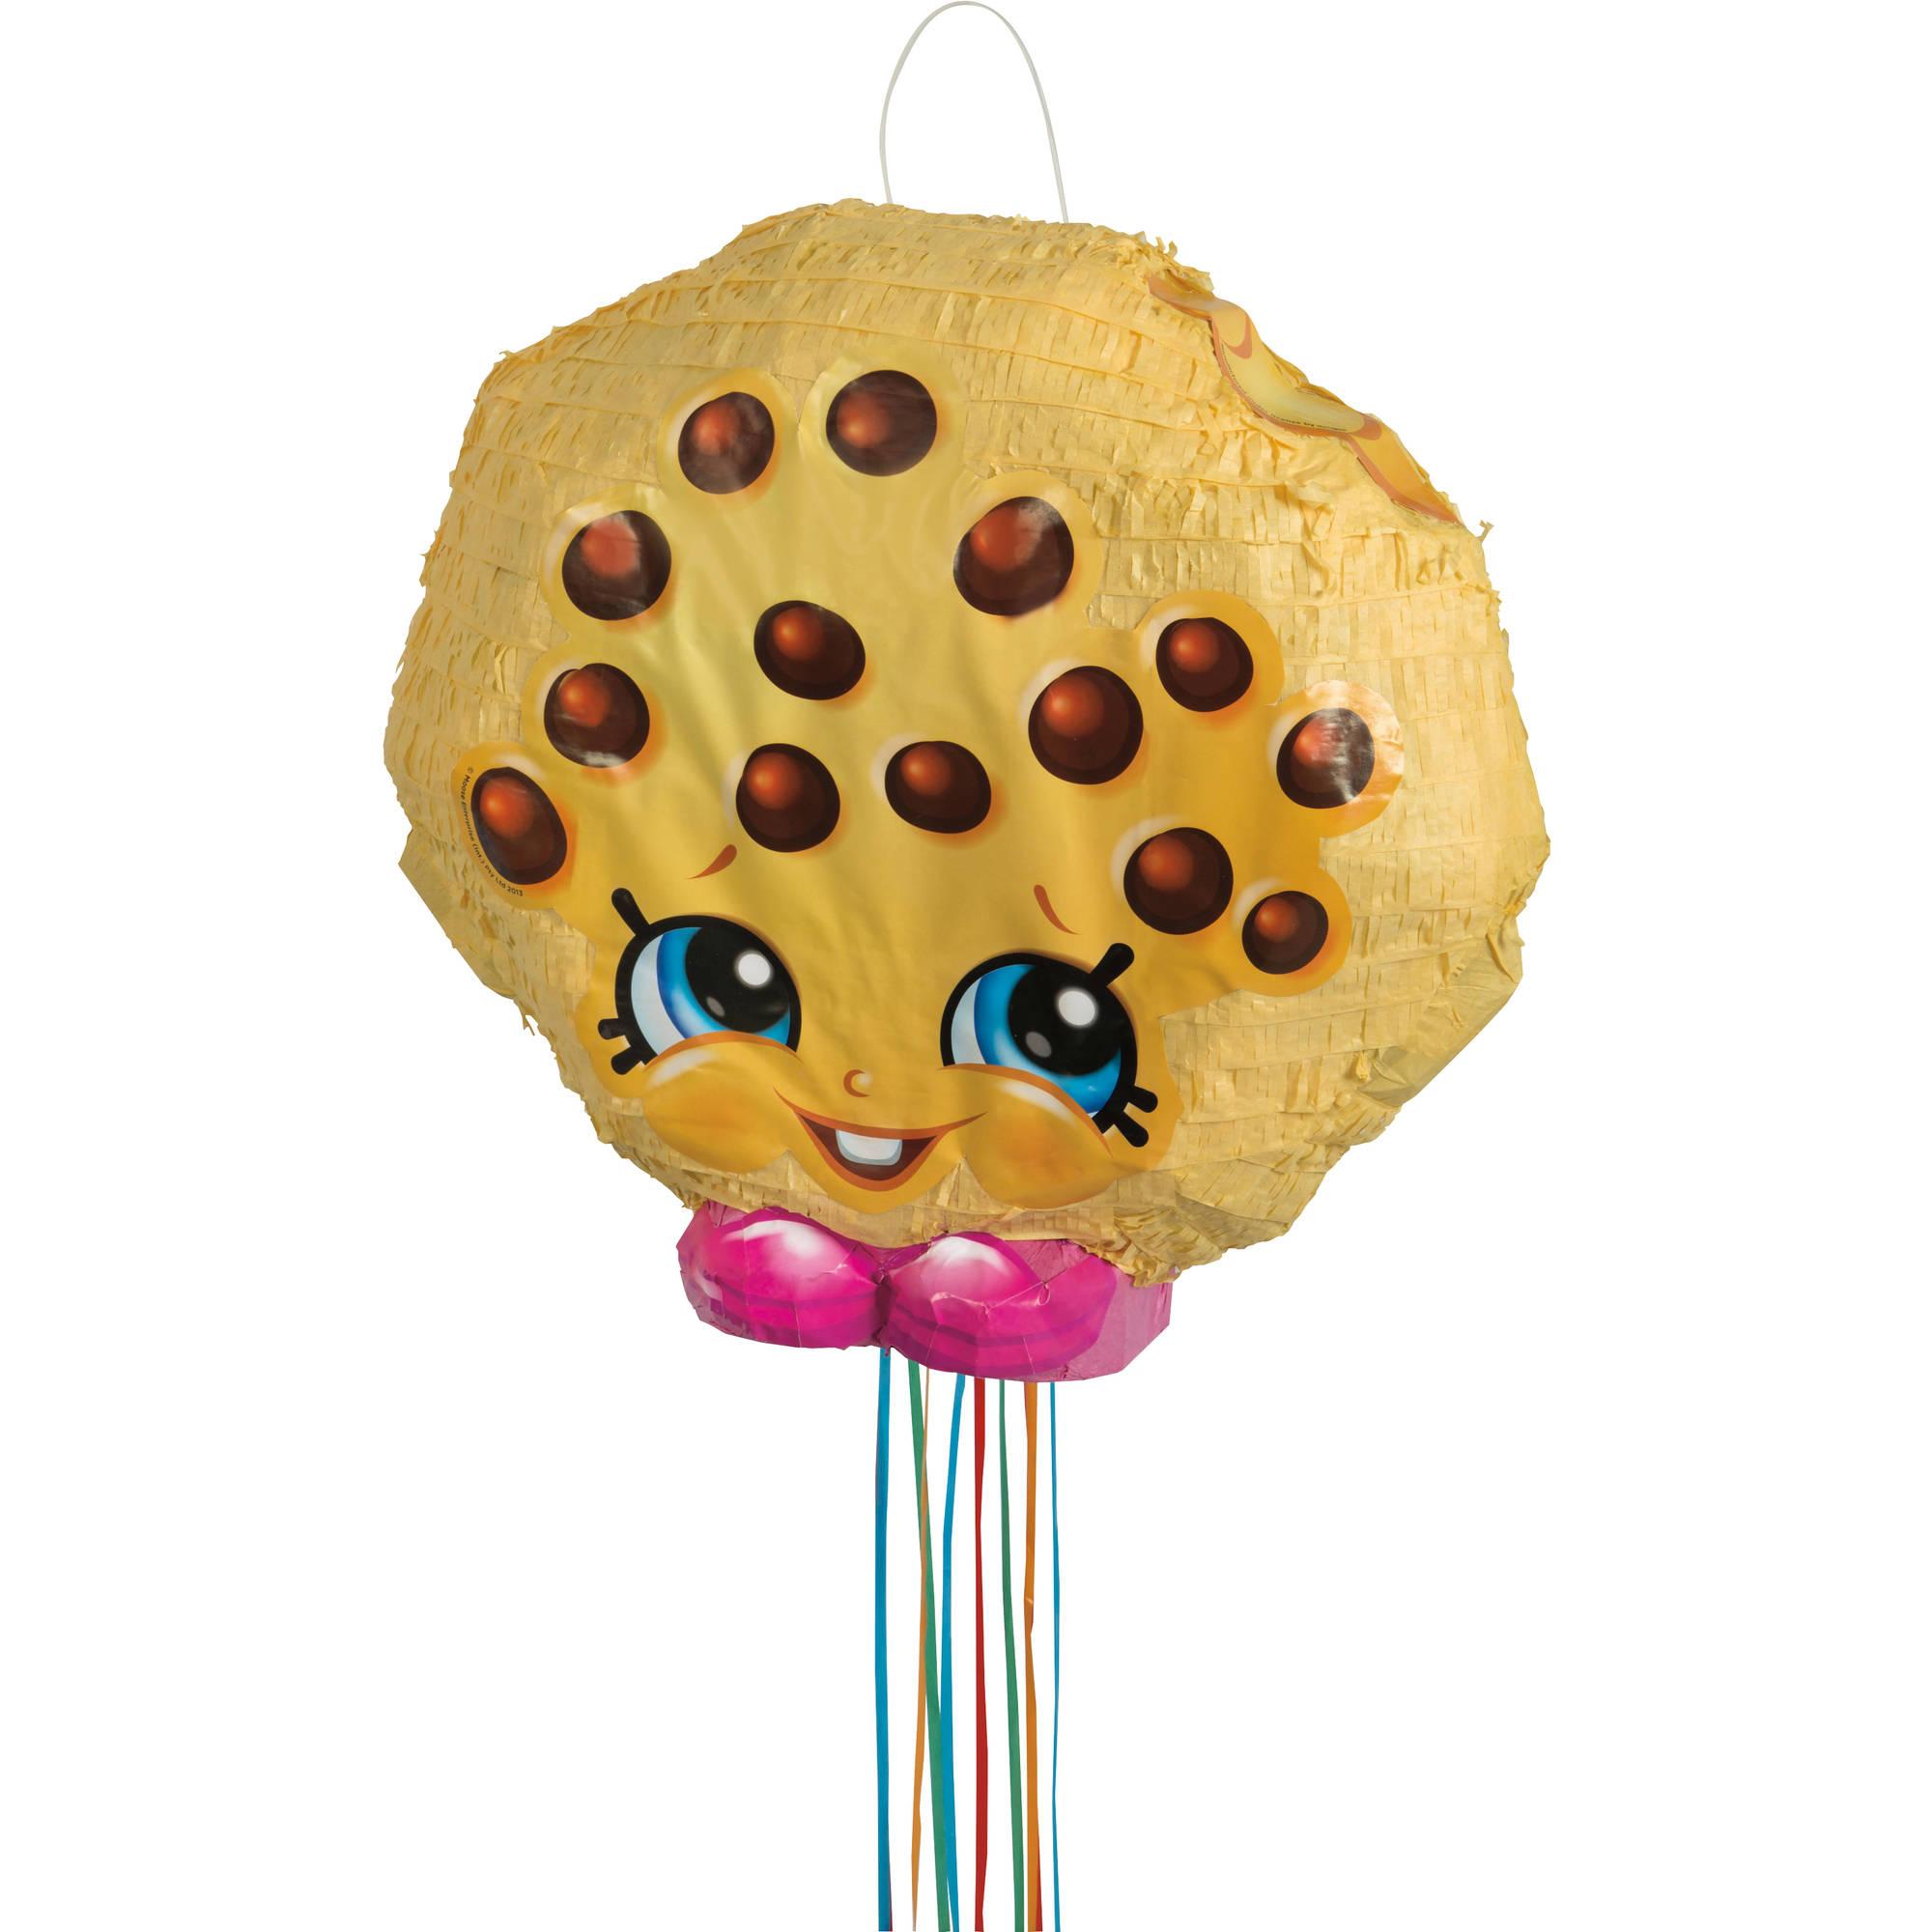 Kookie Cookie Shopkins Pinata, Pull String, 17 x 17 in, 1ct